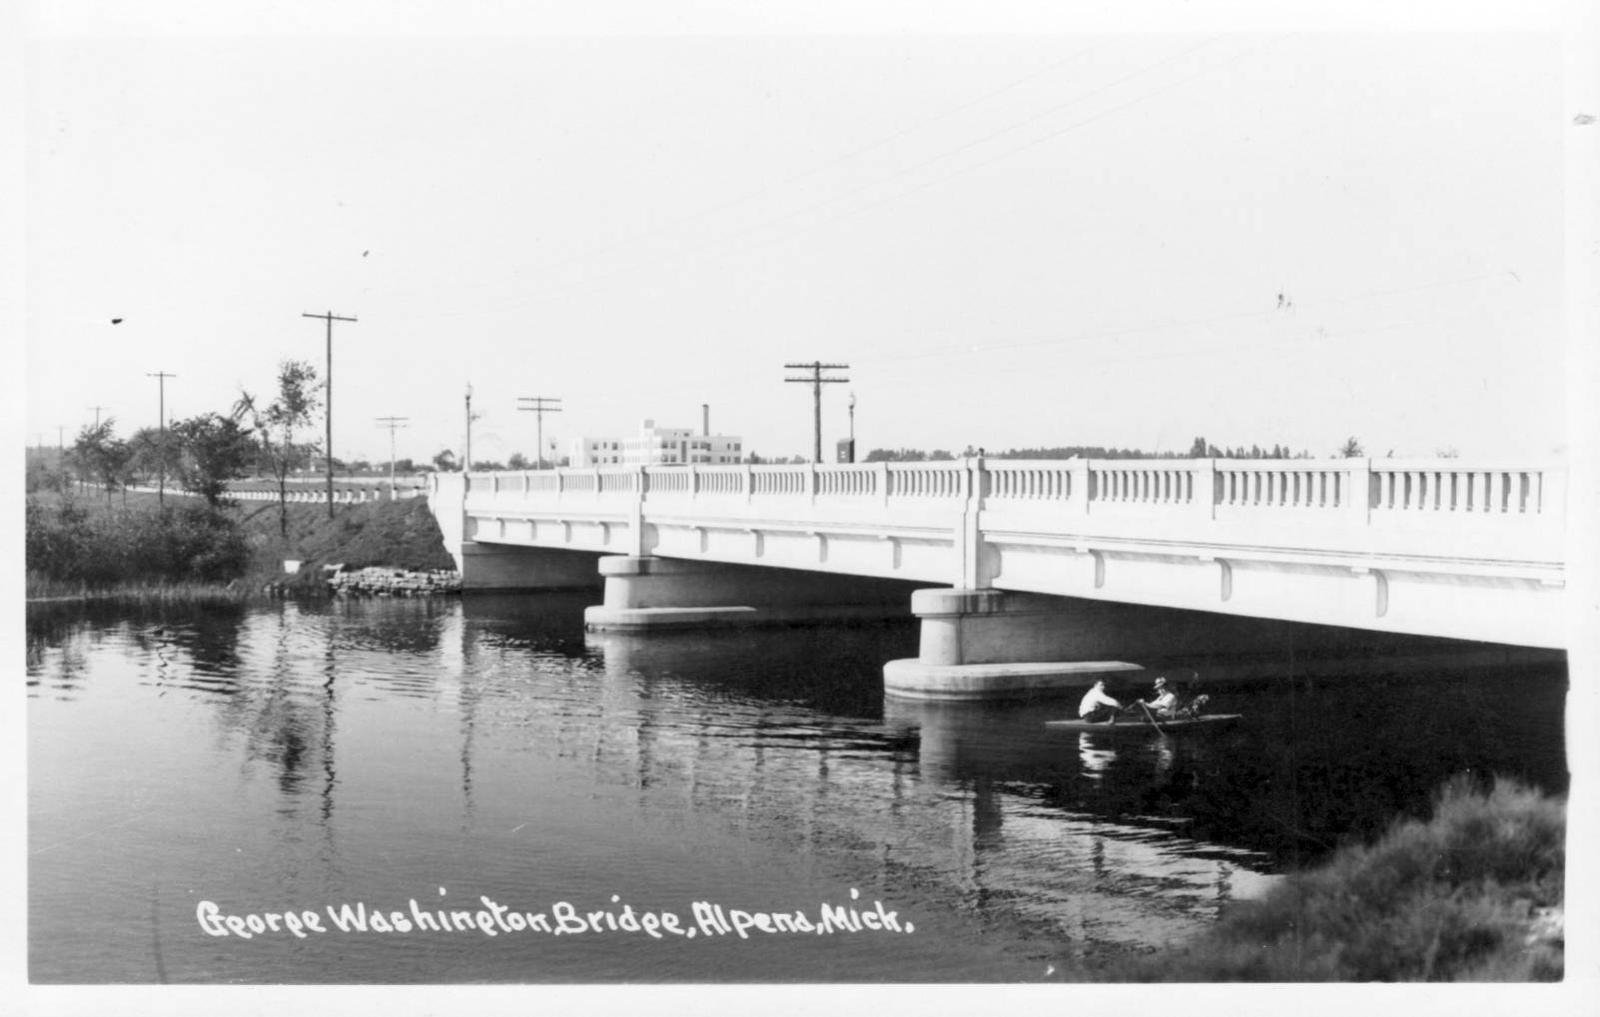 Chisholm Street Bridge